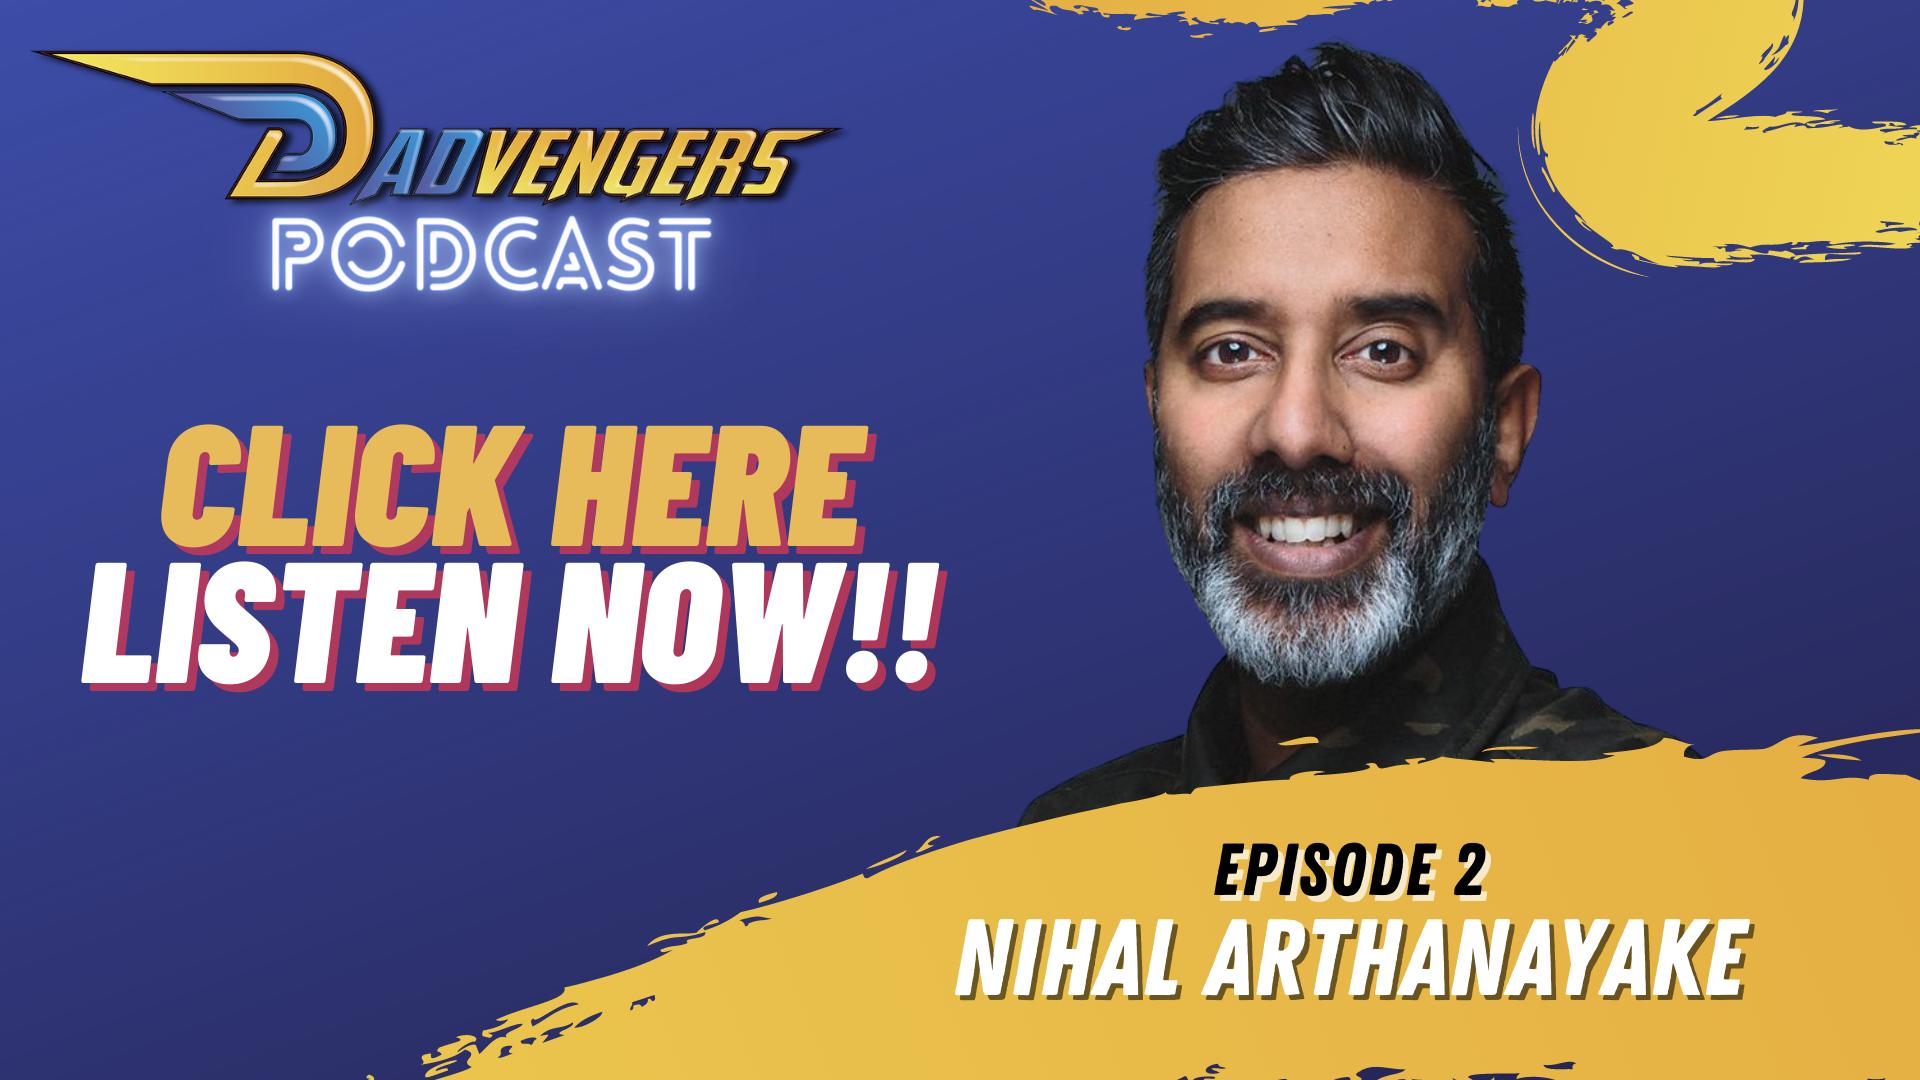 Podcast Ep 2 - Nihal Arthanayake Webslider(1920x1080)